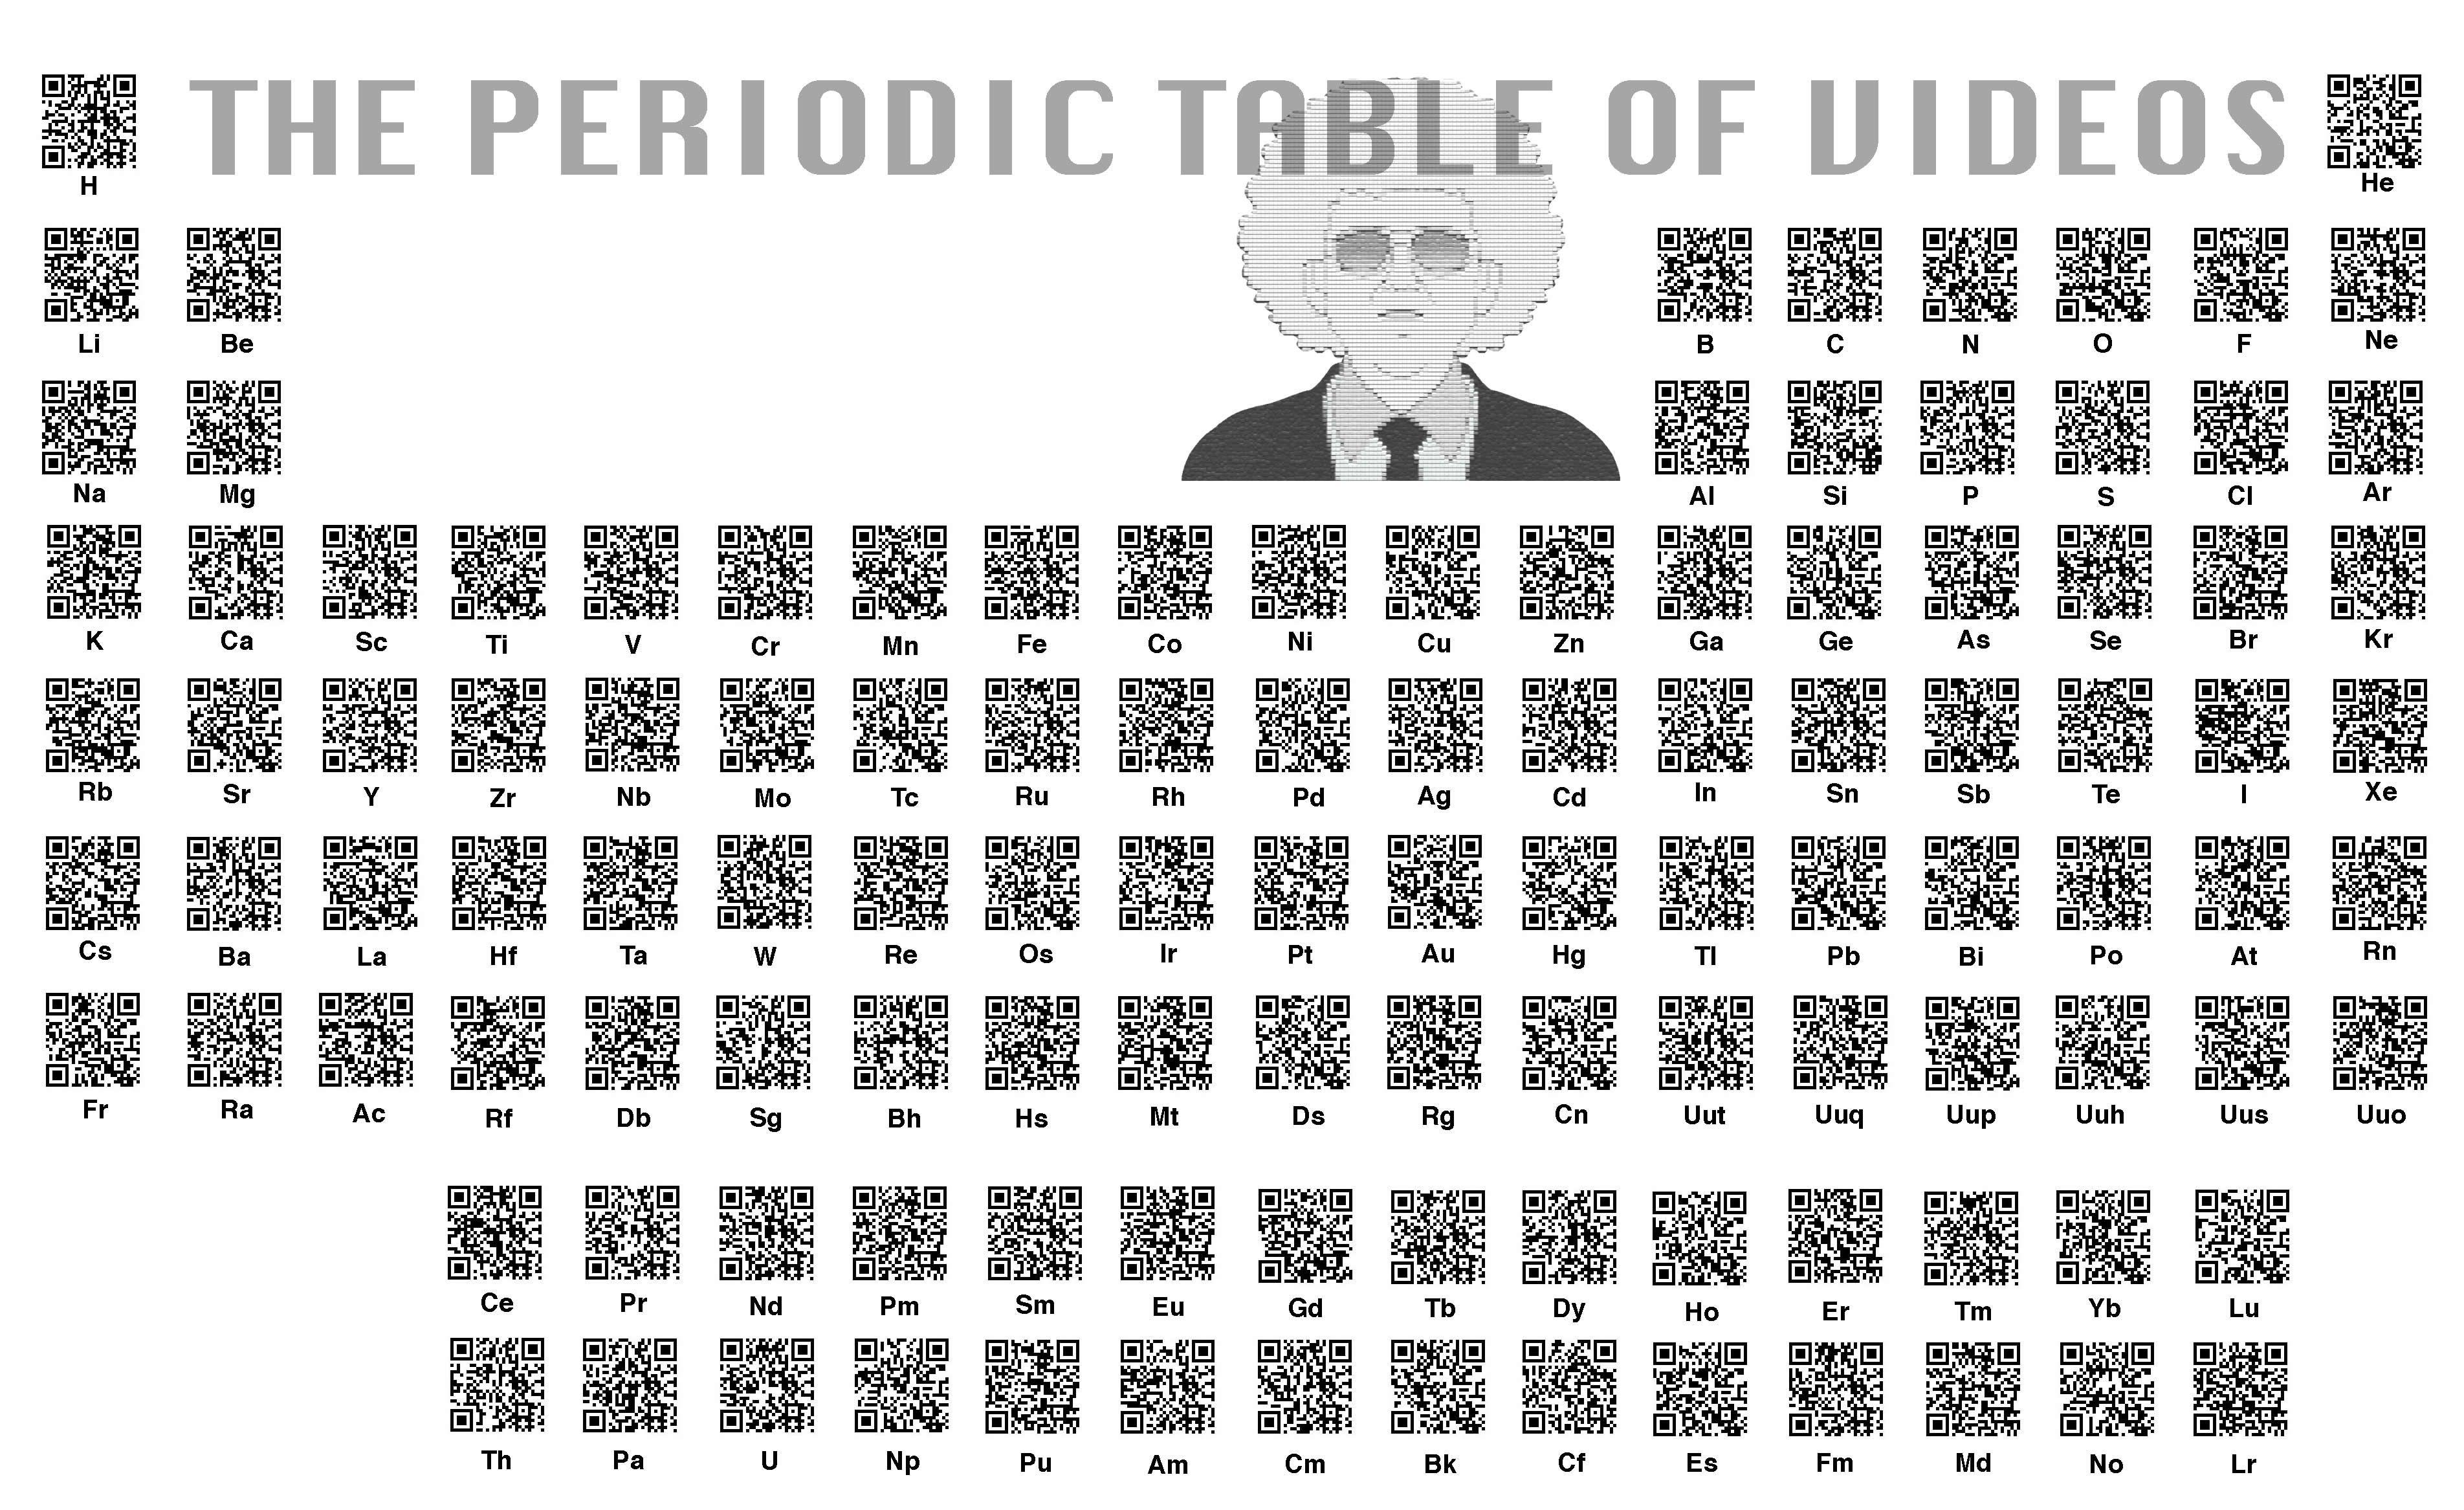 The university of nottingham has created the periodic table of the university of nottingham has created the periodic table of videos these are short videos urtaz Images